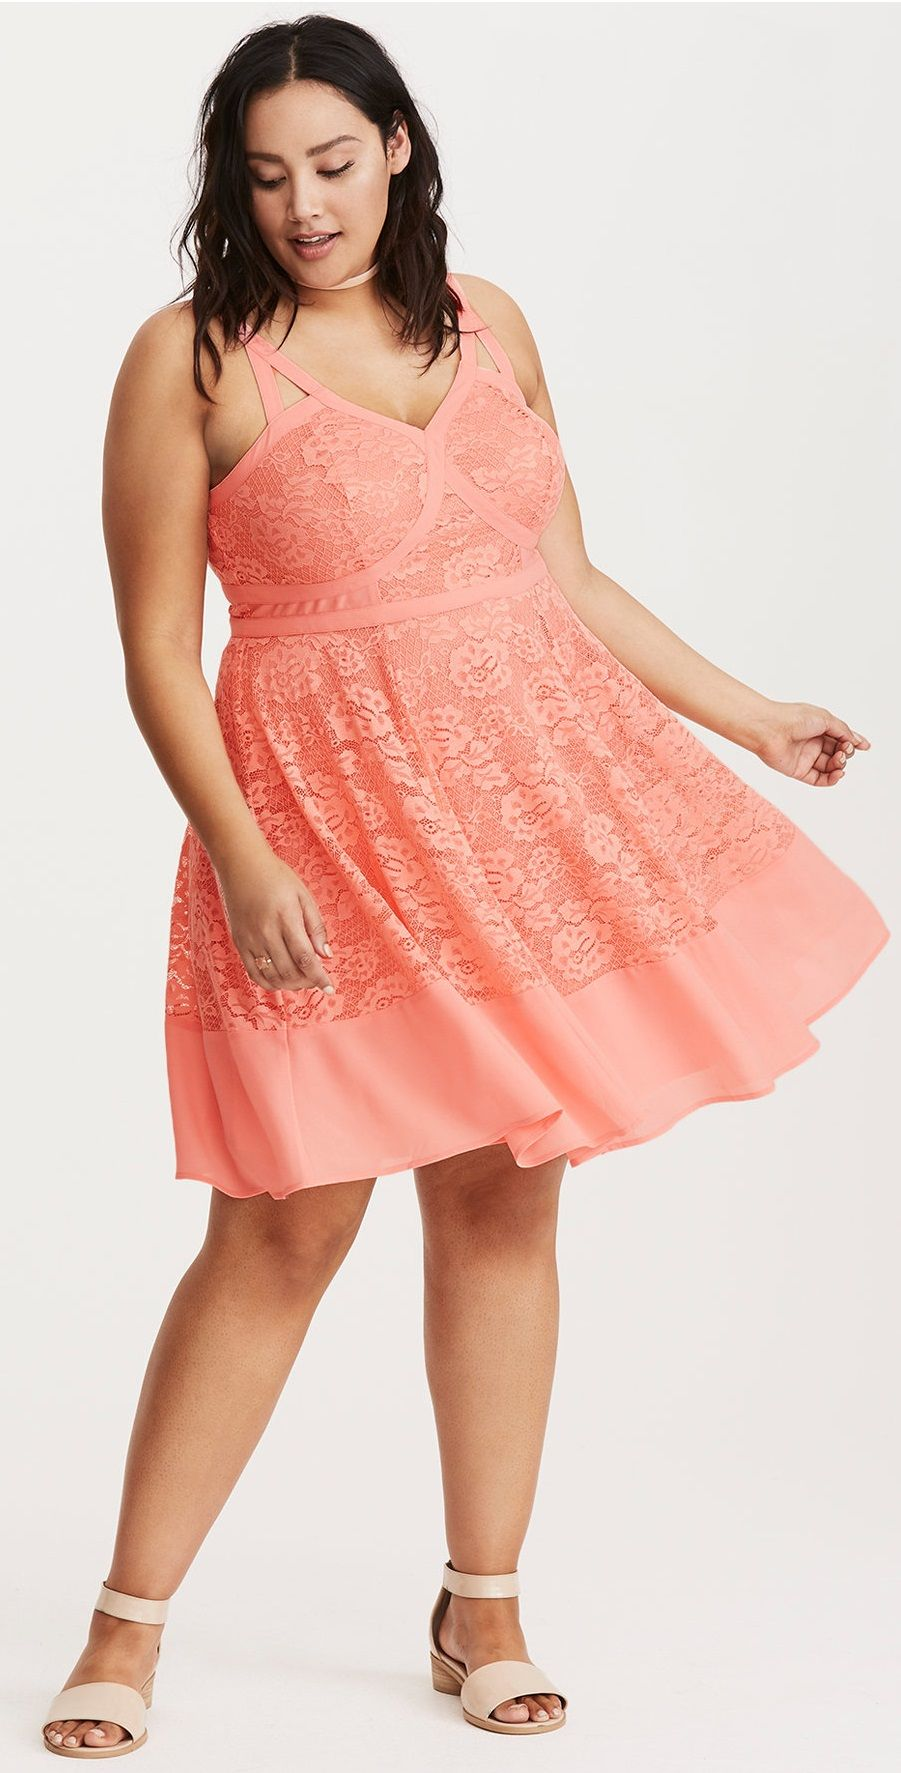 528ebbe8a5 Plus Size Strappy Lace Skater Dress